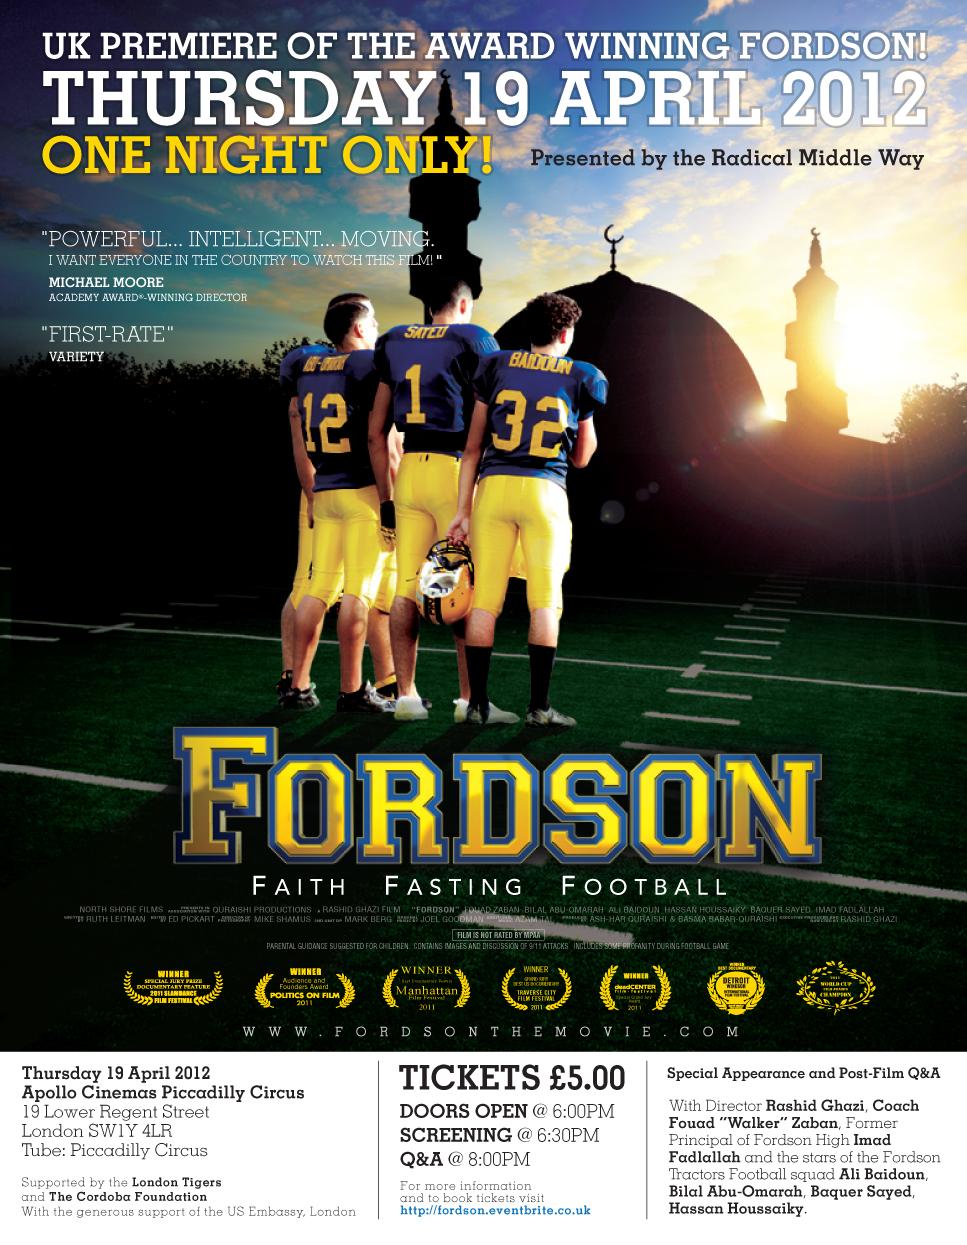 UK Premiere Poster